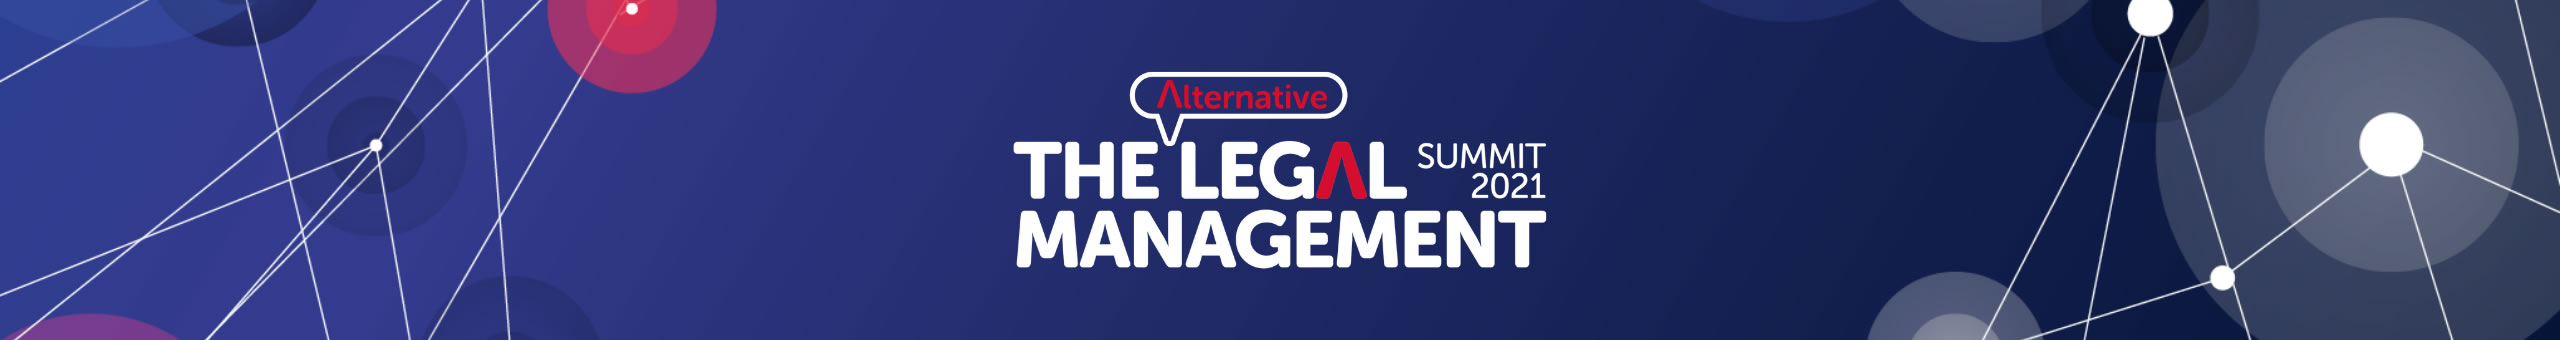 THE ALTERNATIVE LEGAL MANAGEMENT SUMMIT